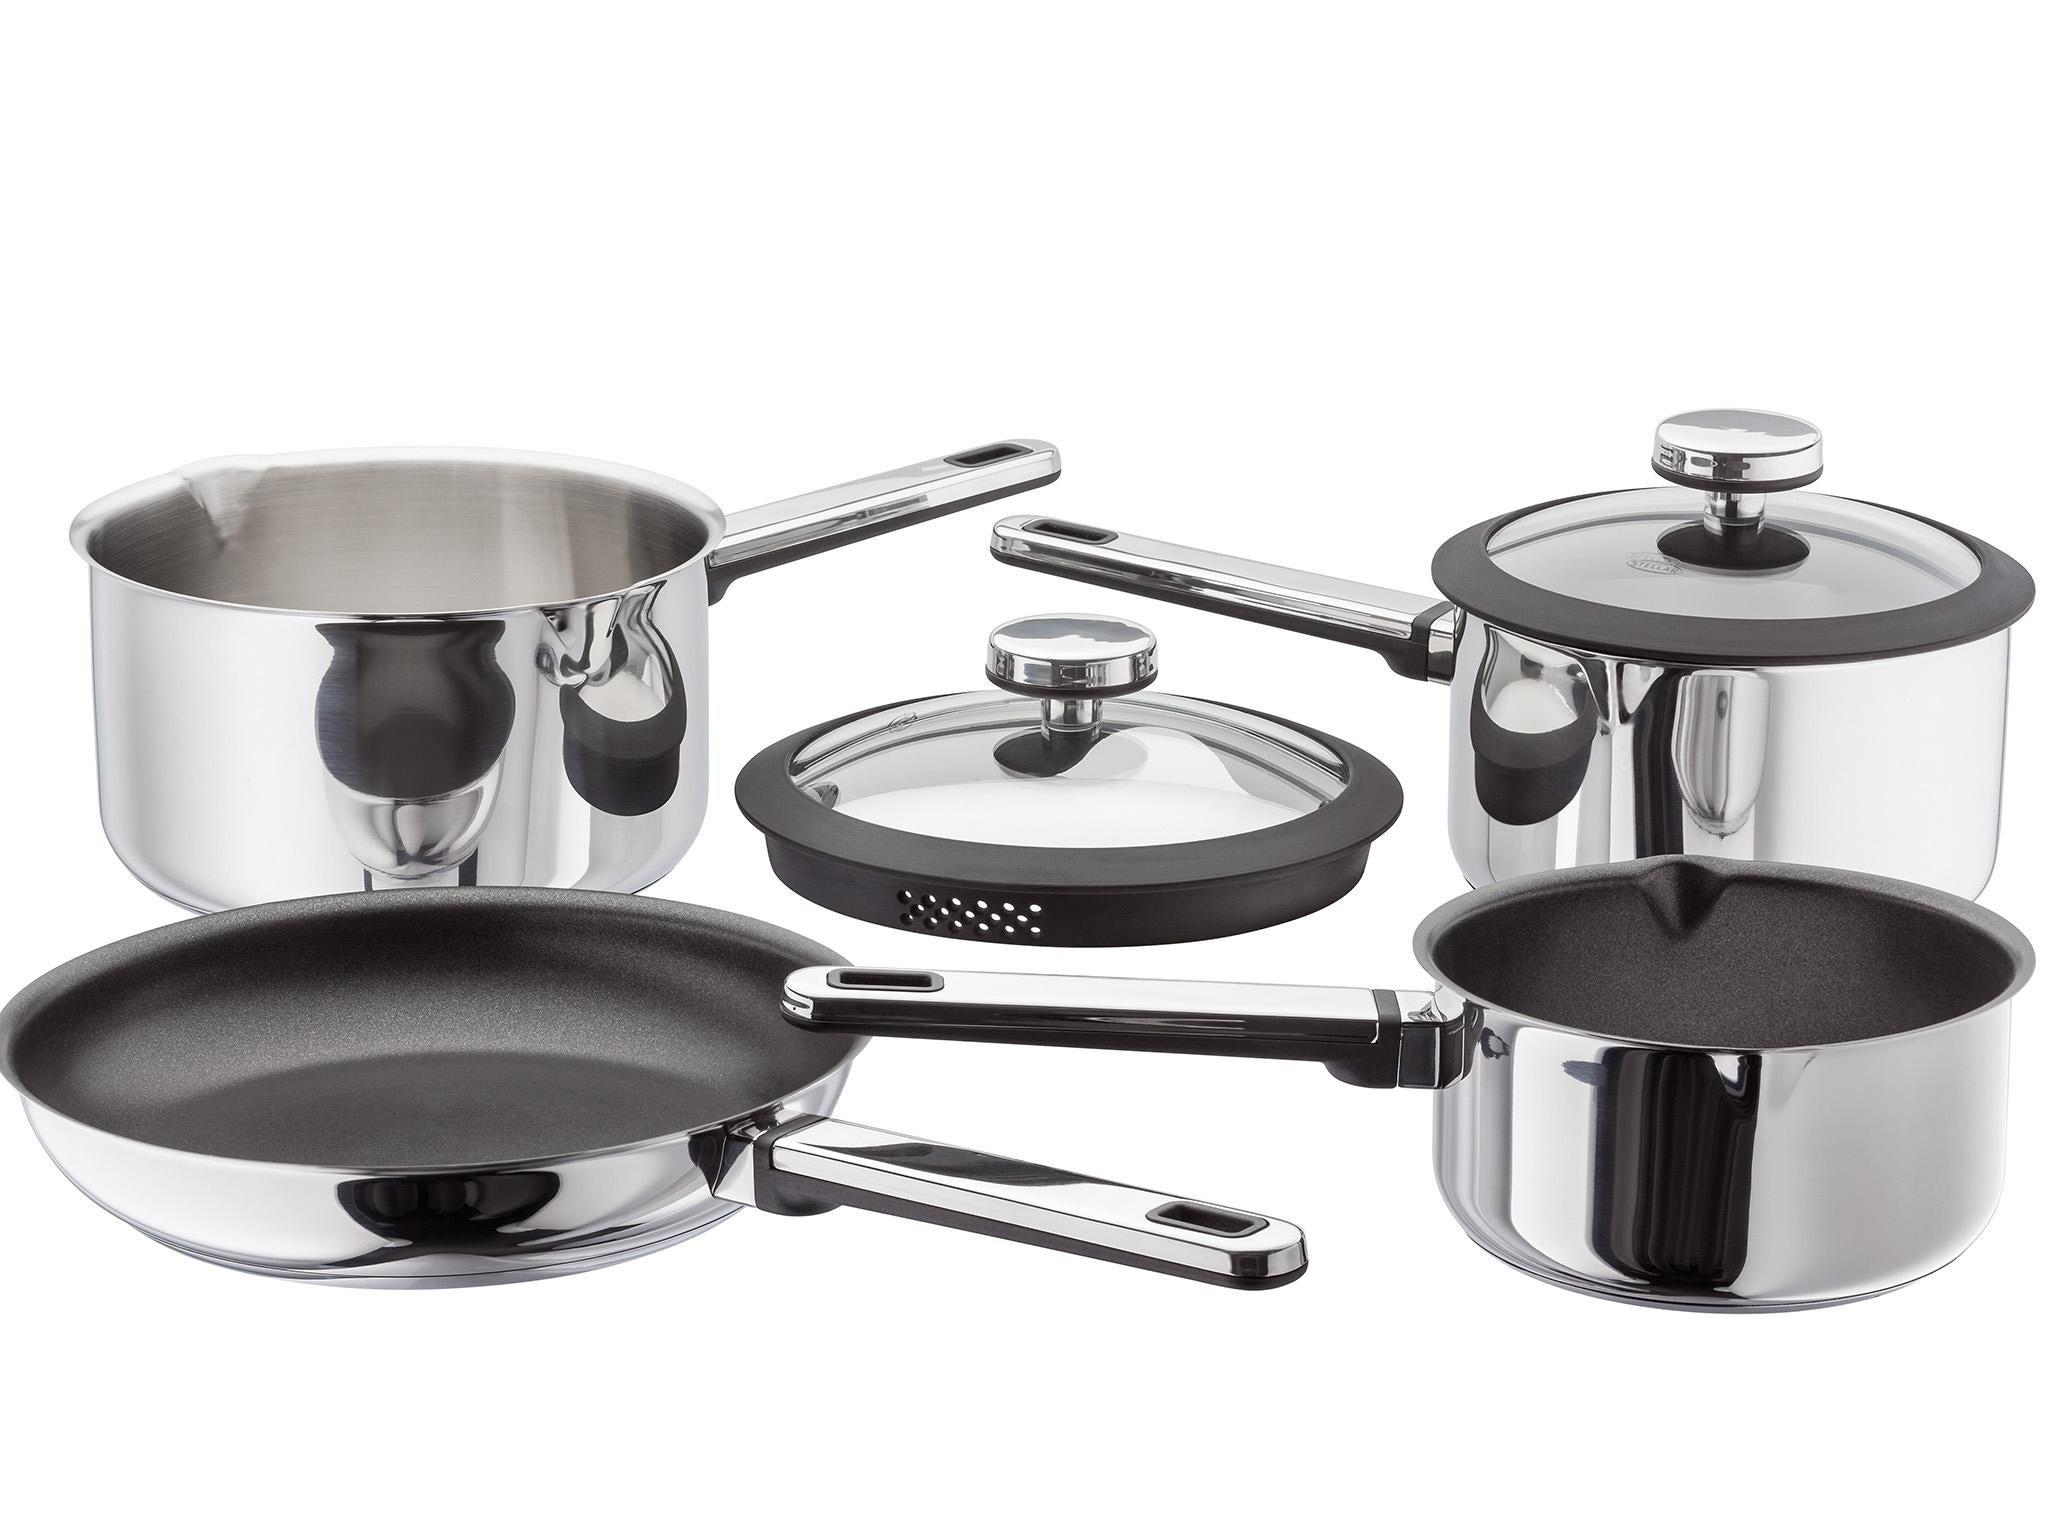 Best saucepan set built for durabilty and non-stick qualities